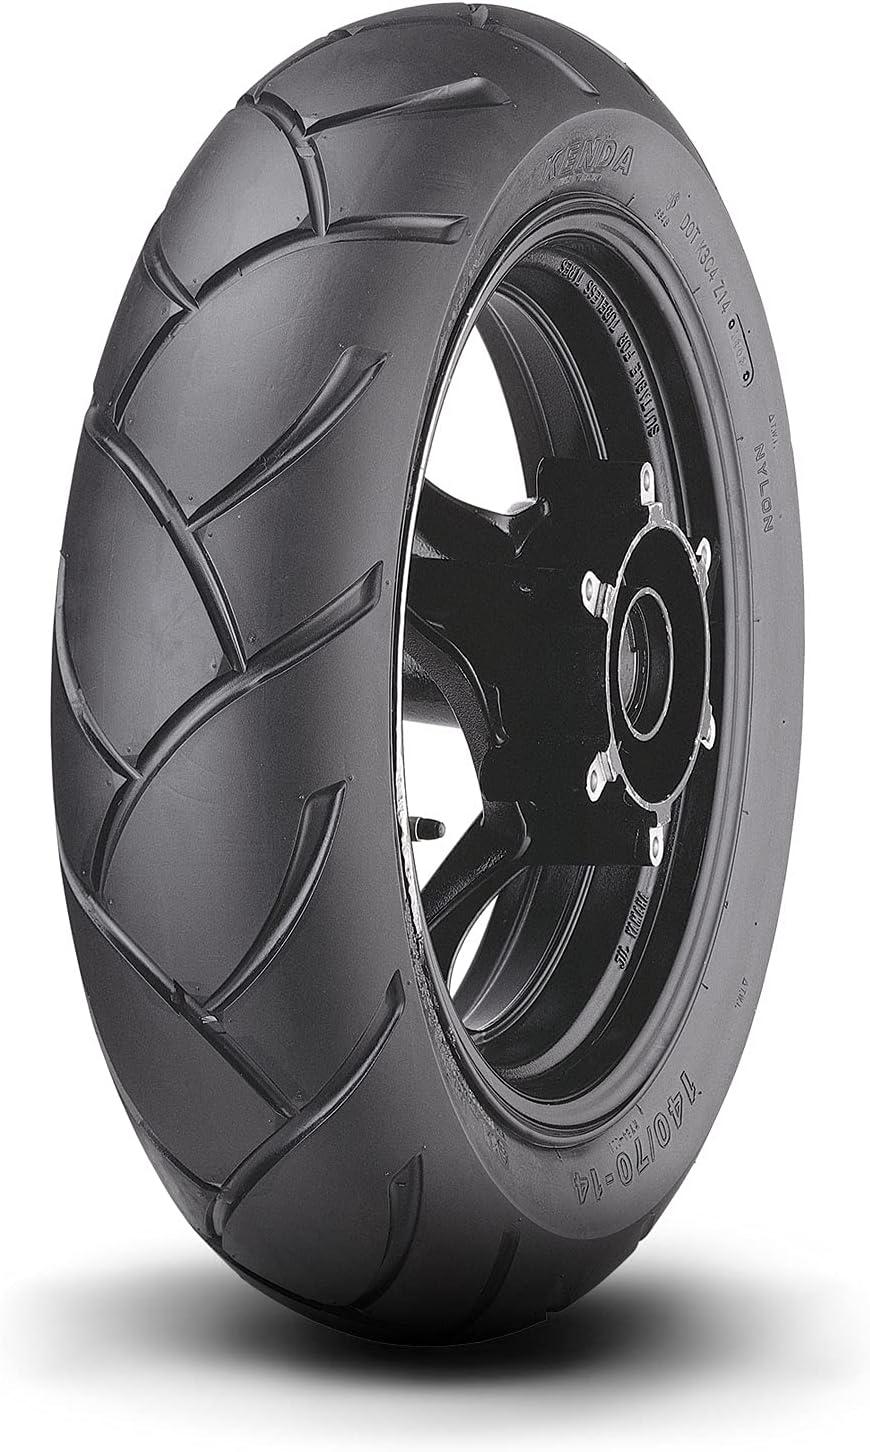 Branded goods KENDA TIRE TUBE K764 Black Tire Low price Motorcycle